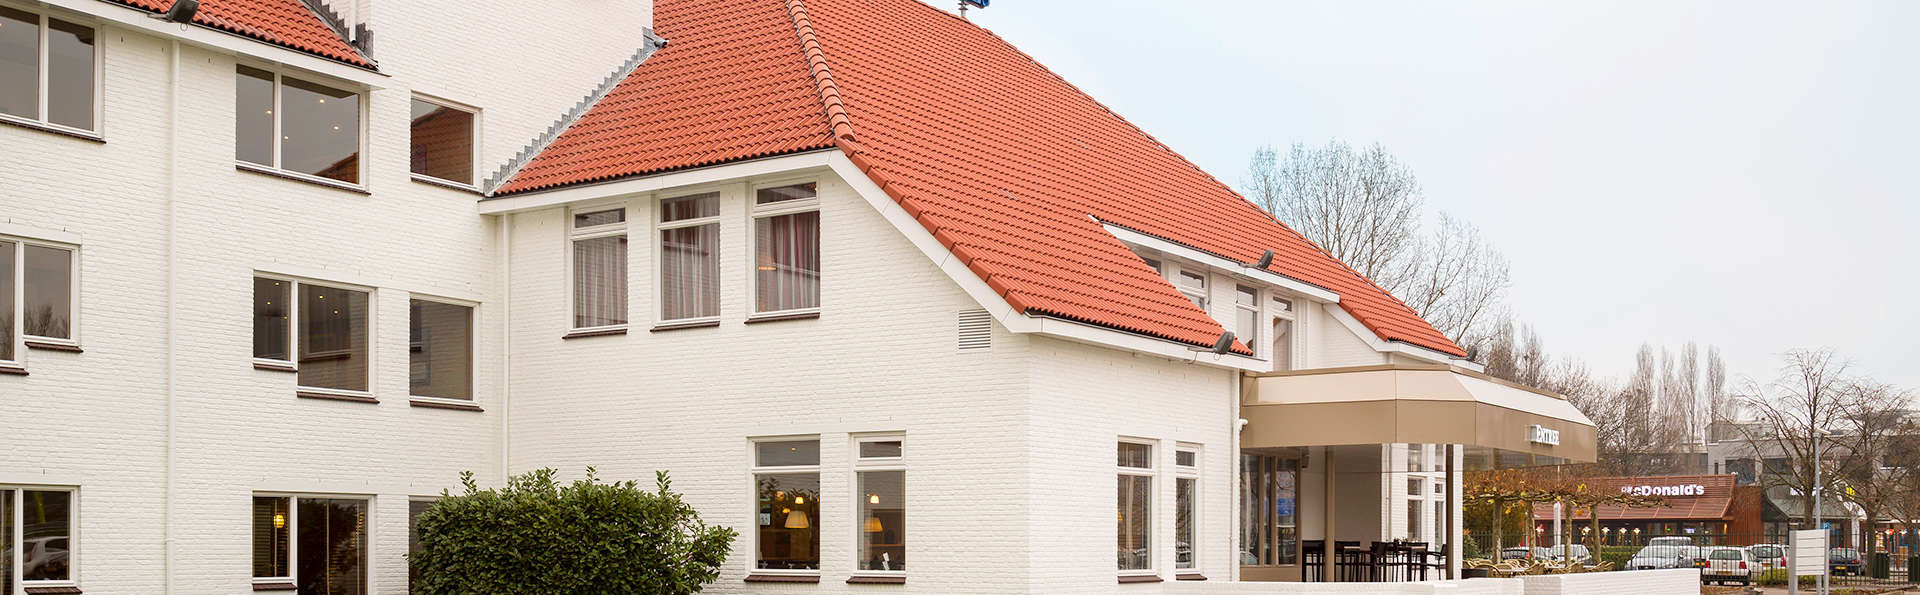 Fletcher Hotel-Restaurant 's-Hertogenbosch - EDIT_Exterior1.jpg